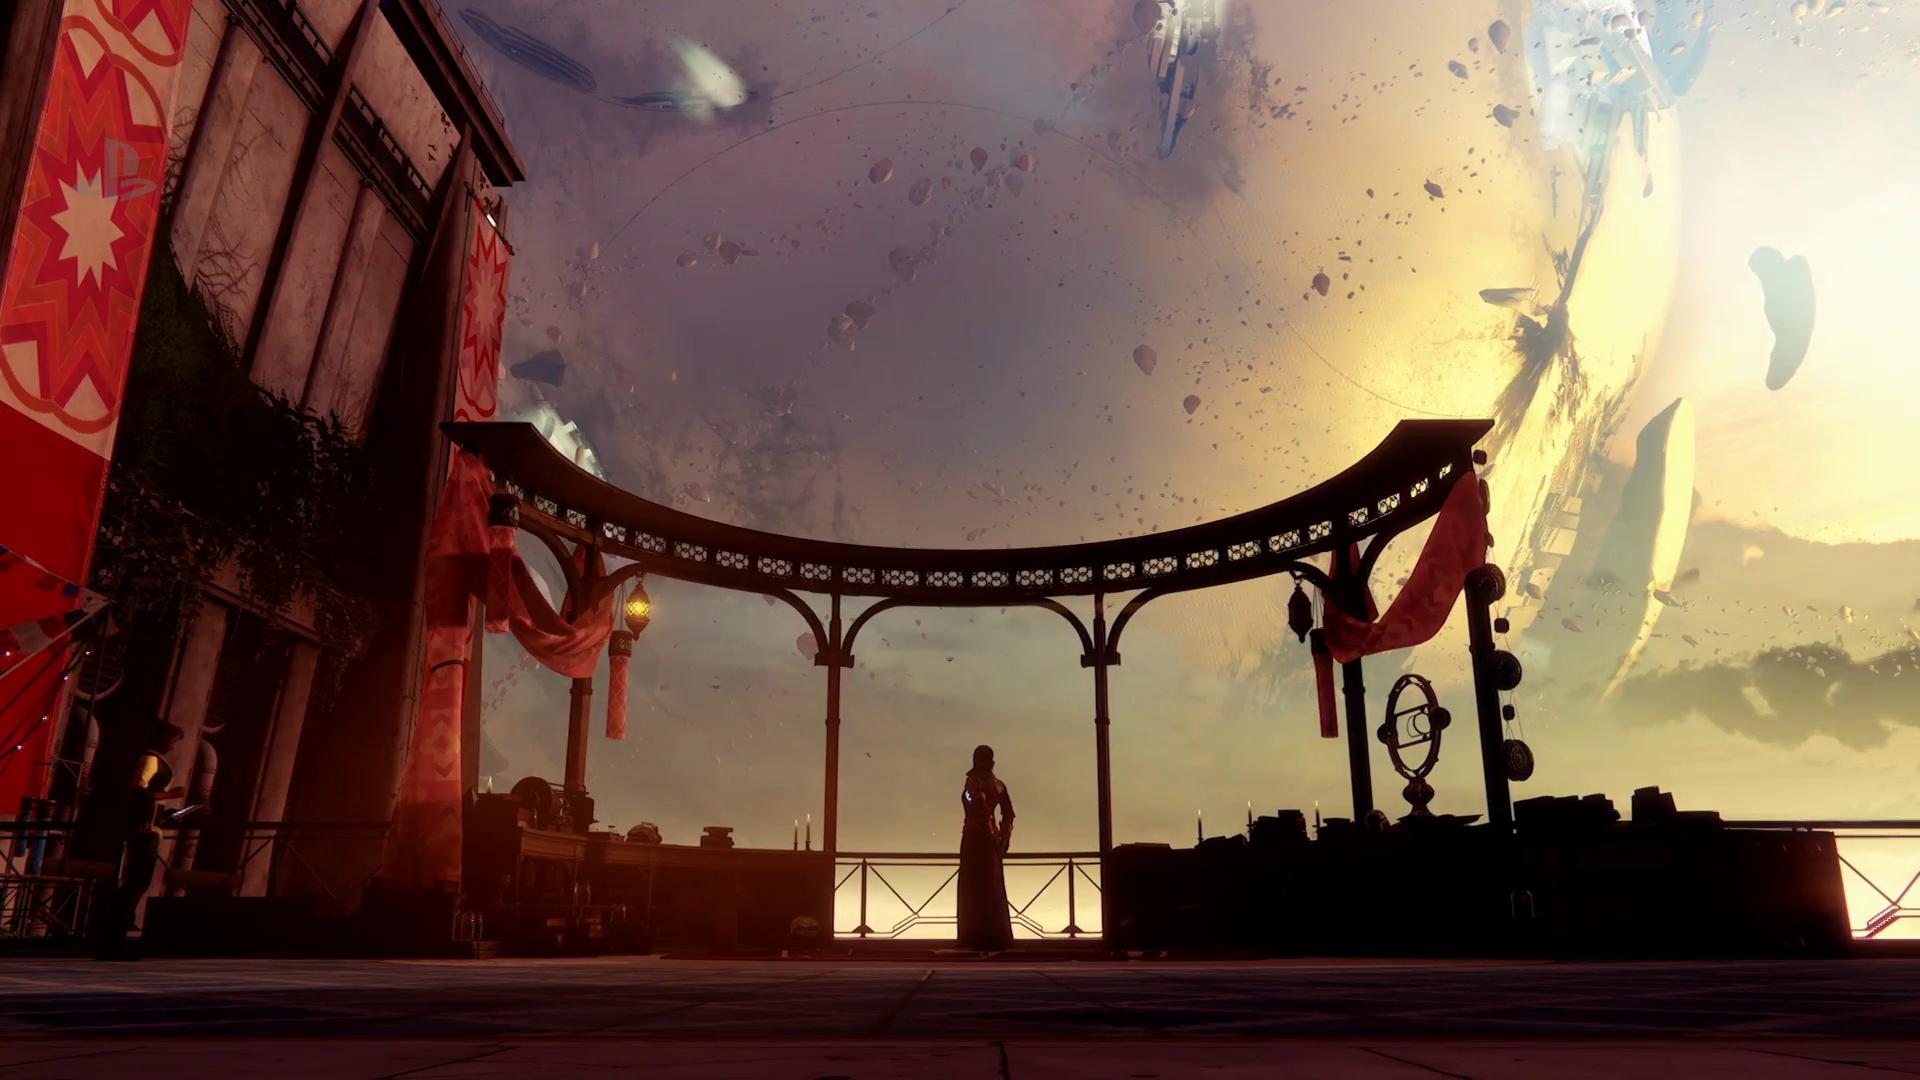 Destiny 2: Black Armory launches Dec. 4, reveal set to happen a week earlier